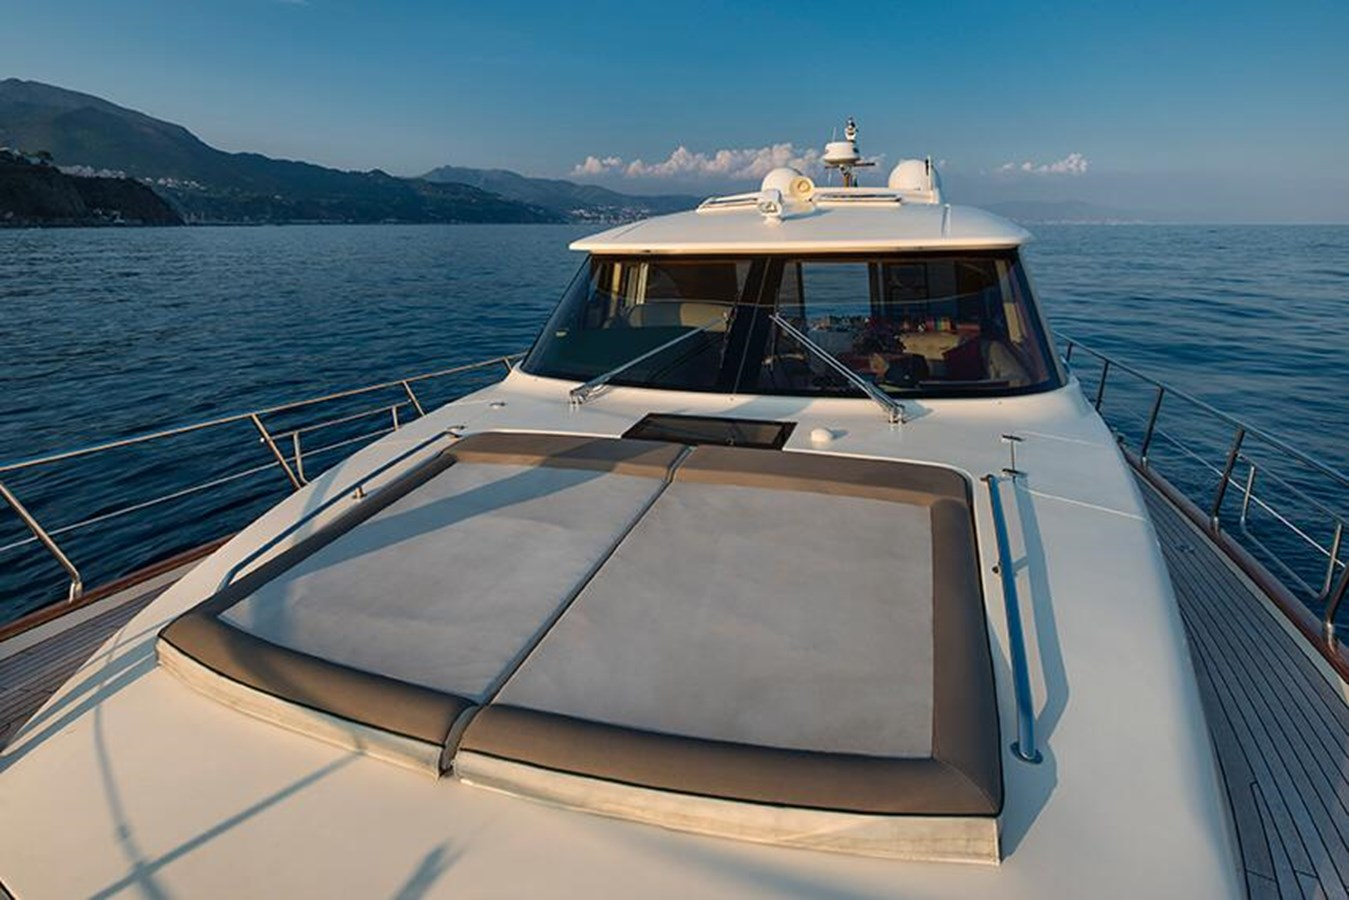 IMG-20200304-WA0019 2011 ABATI YACHTS kEYPORT 60 Motor Yacht 2879779